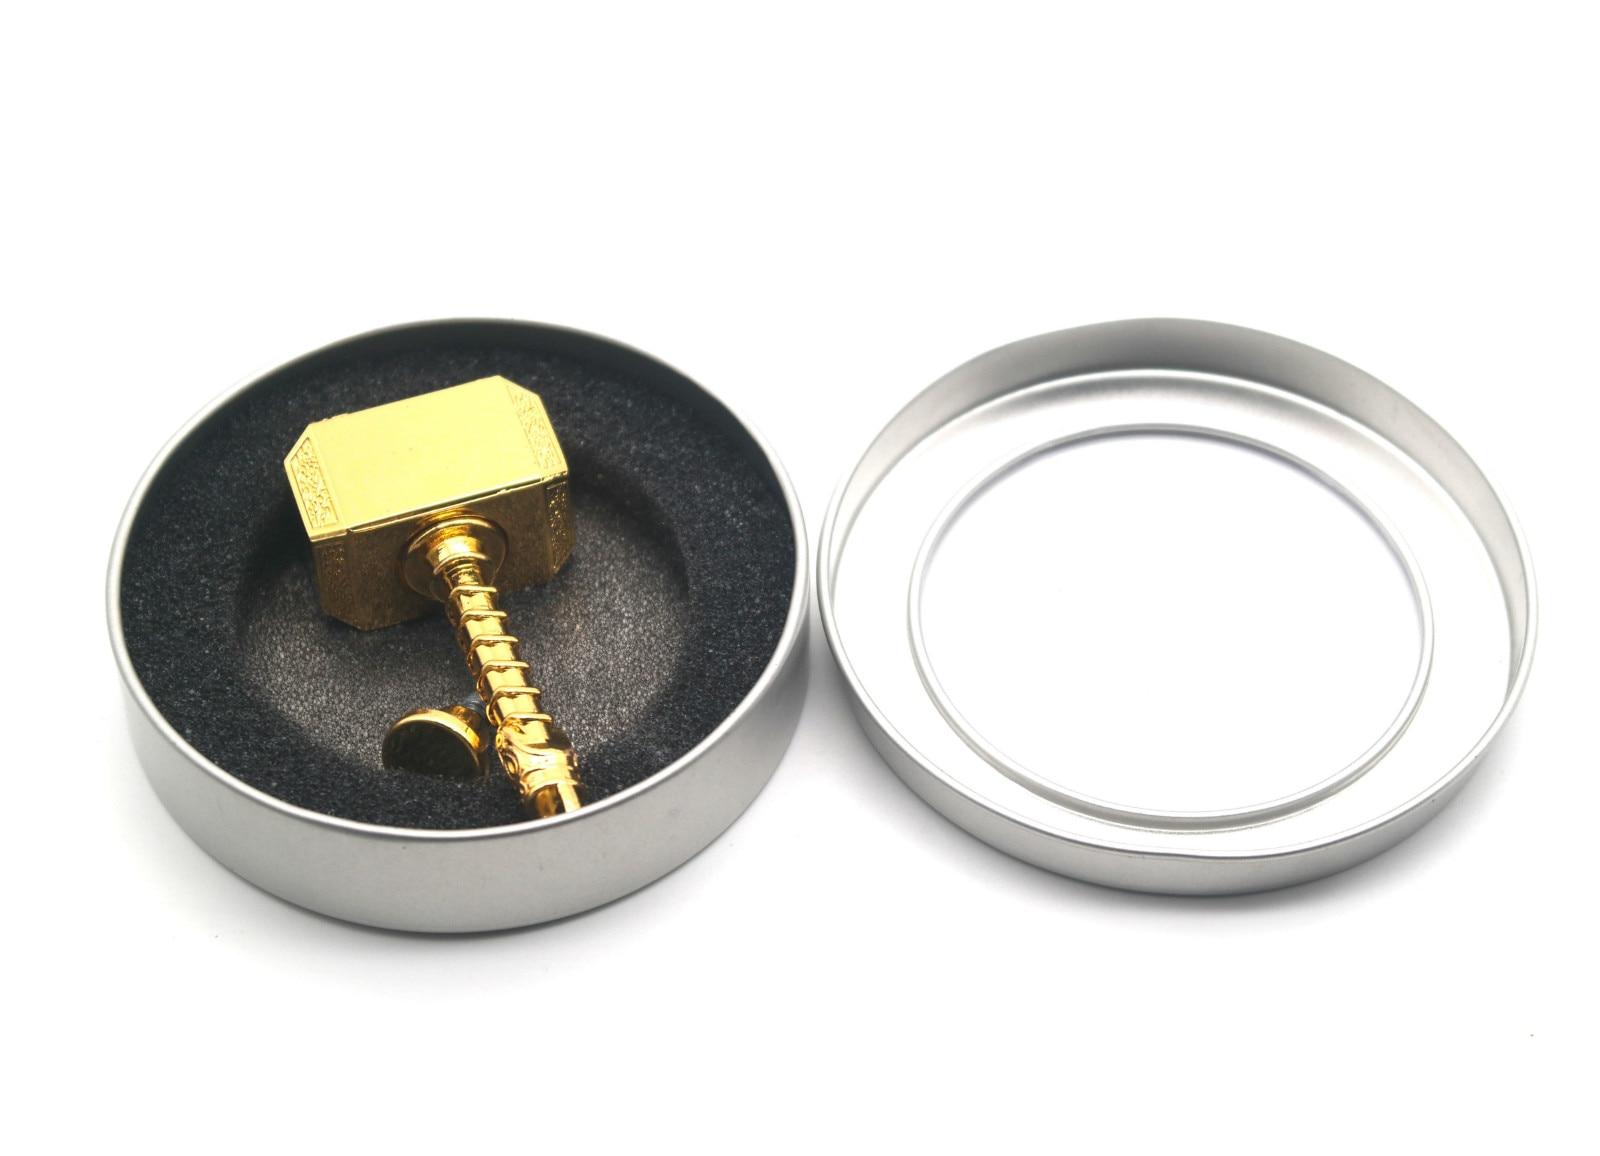 Updated Version Hammer Fidget Spinner Cool Metal Hand Spinner Portable Stress Relief Toys Gift for Children Adult enlarge